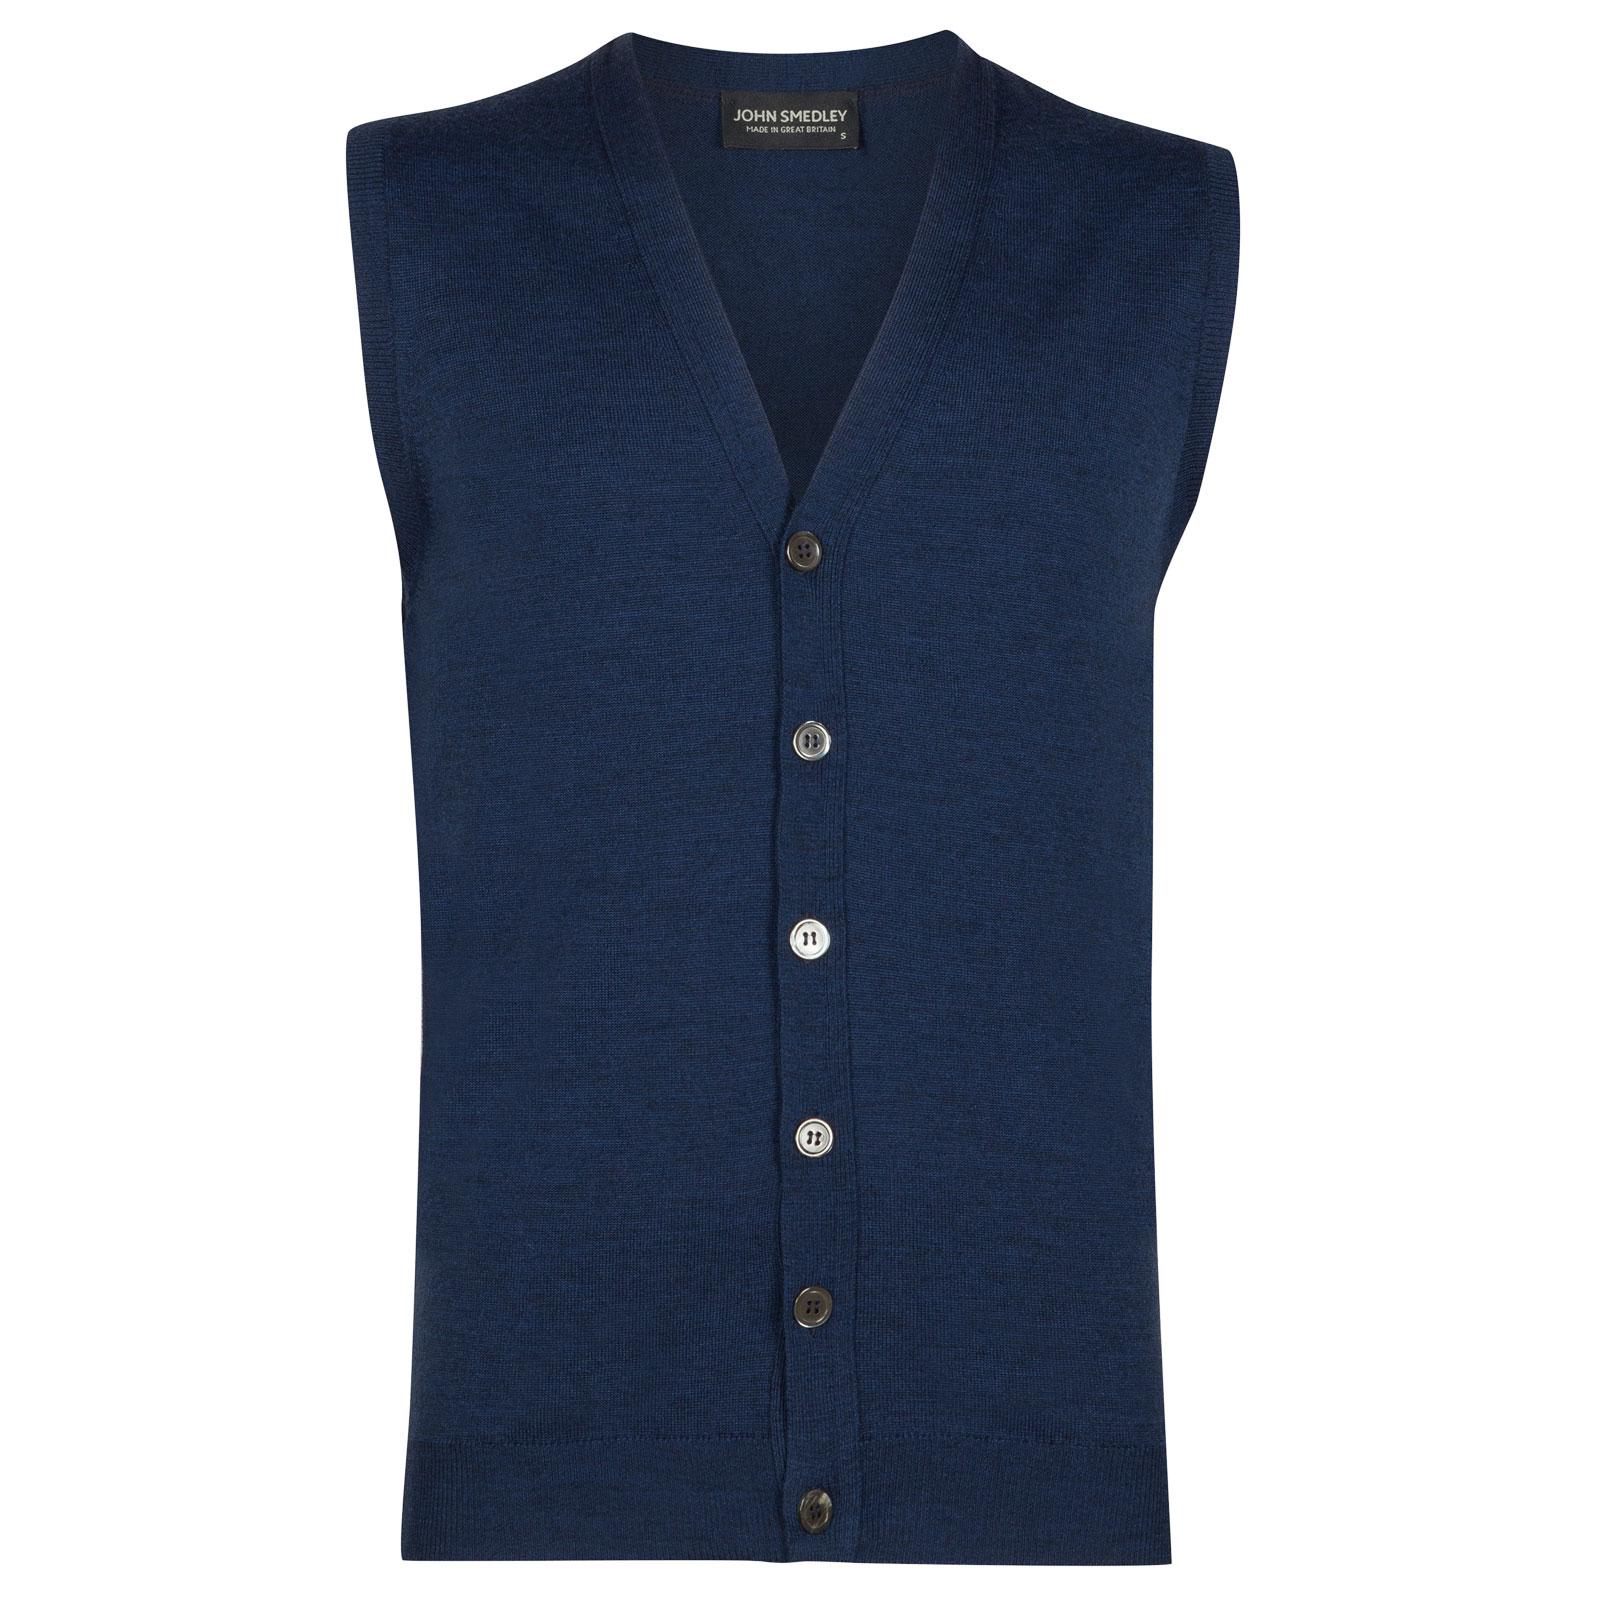 John Smedley stavely Merino Wool Waistcoat in Indigo-M